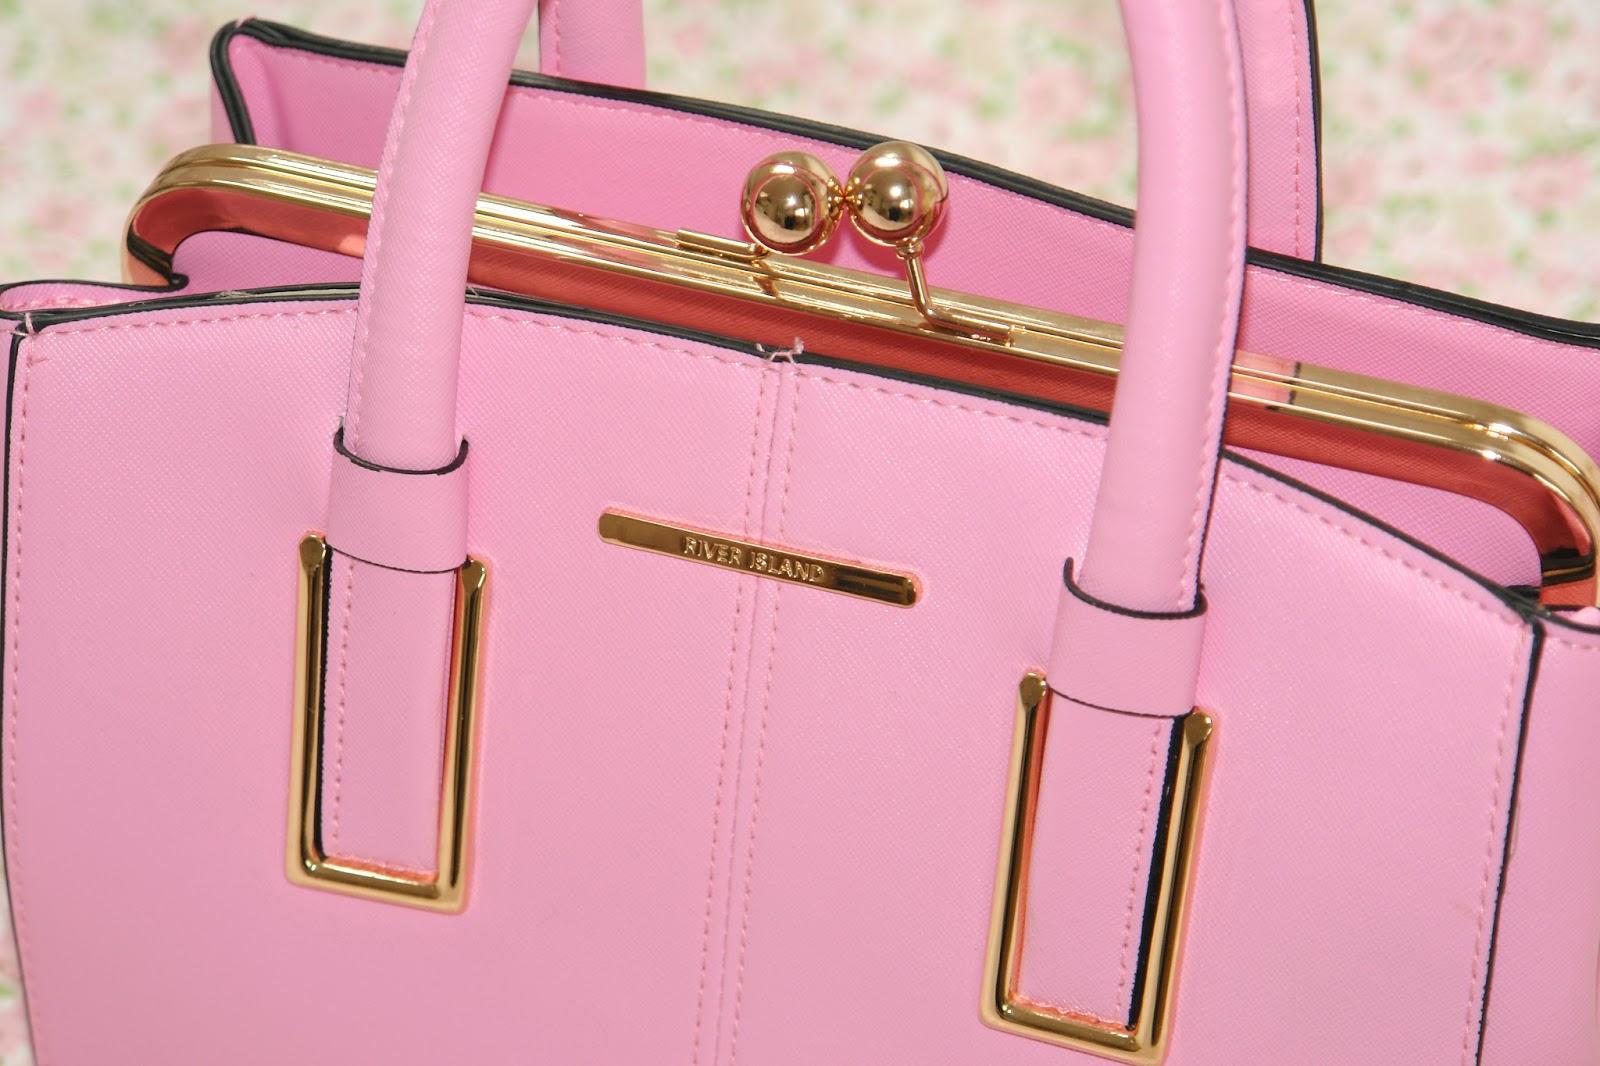 River Island Light Pink Mini Structured Tote Bag, review, summer, 2014, S/S, spring, bags, pink, River Island, pink handbag, fashion, blogger, UK blogger, top UK blogger